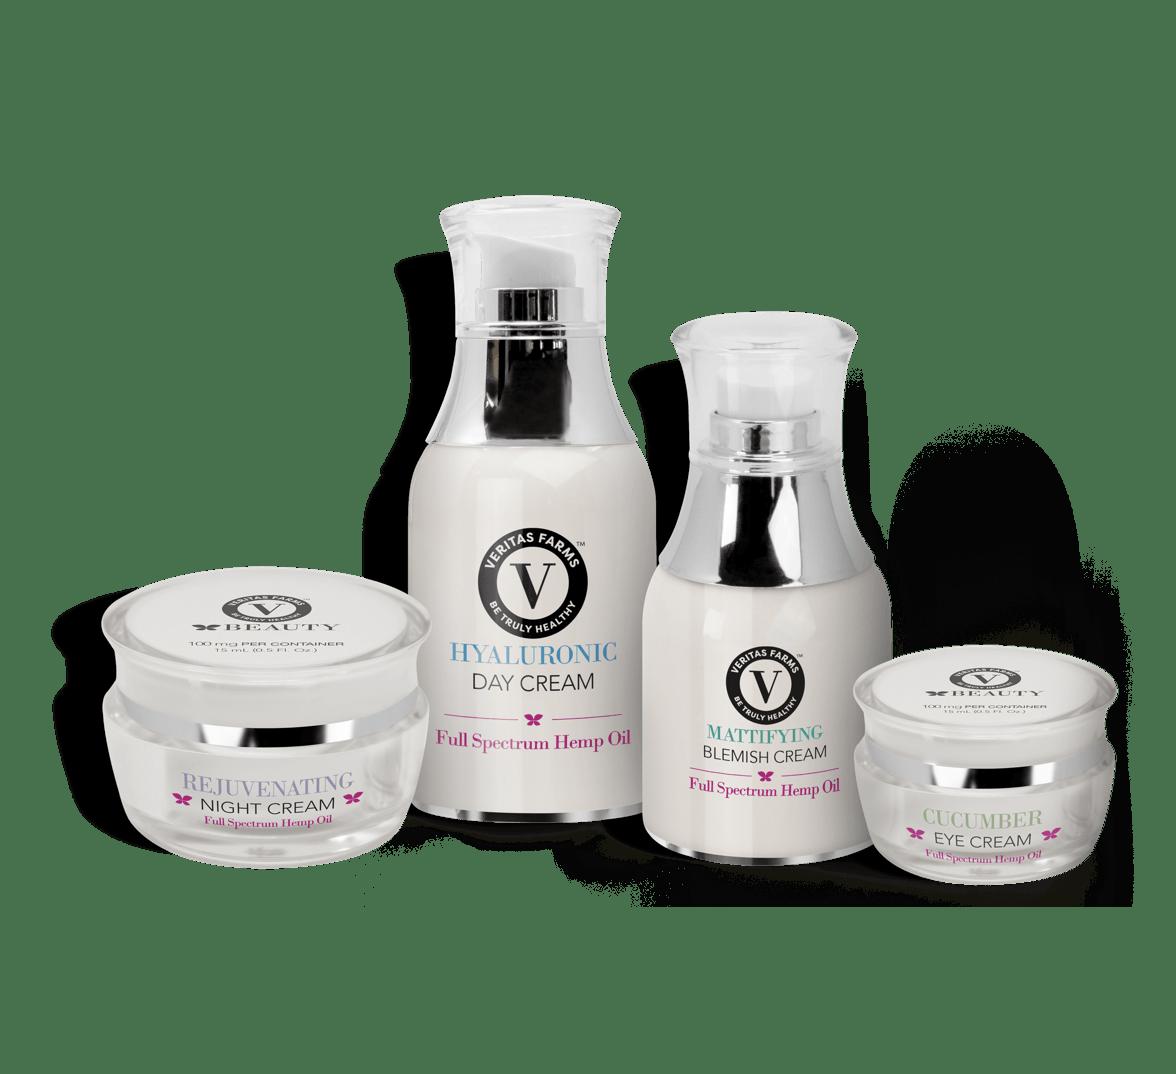 veritas farms skin care bundle